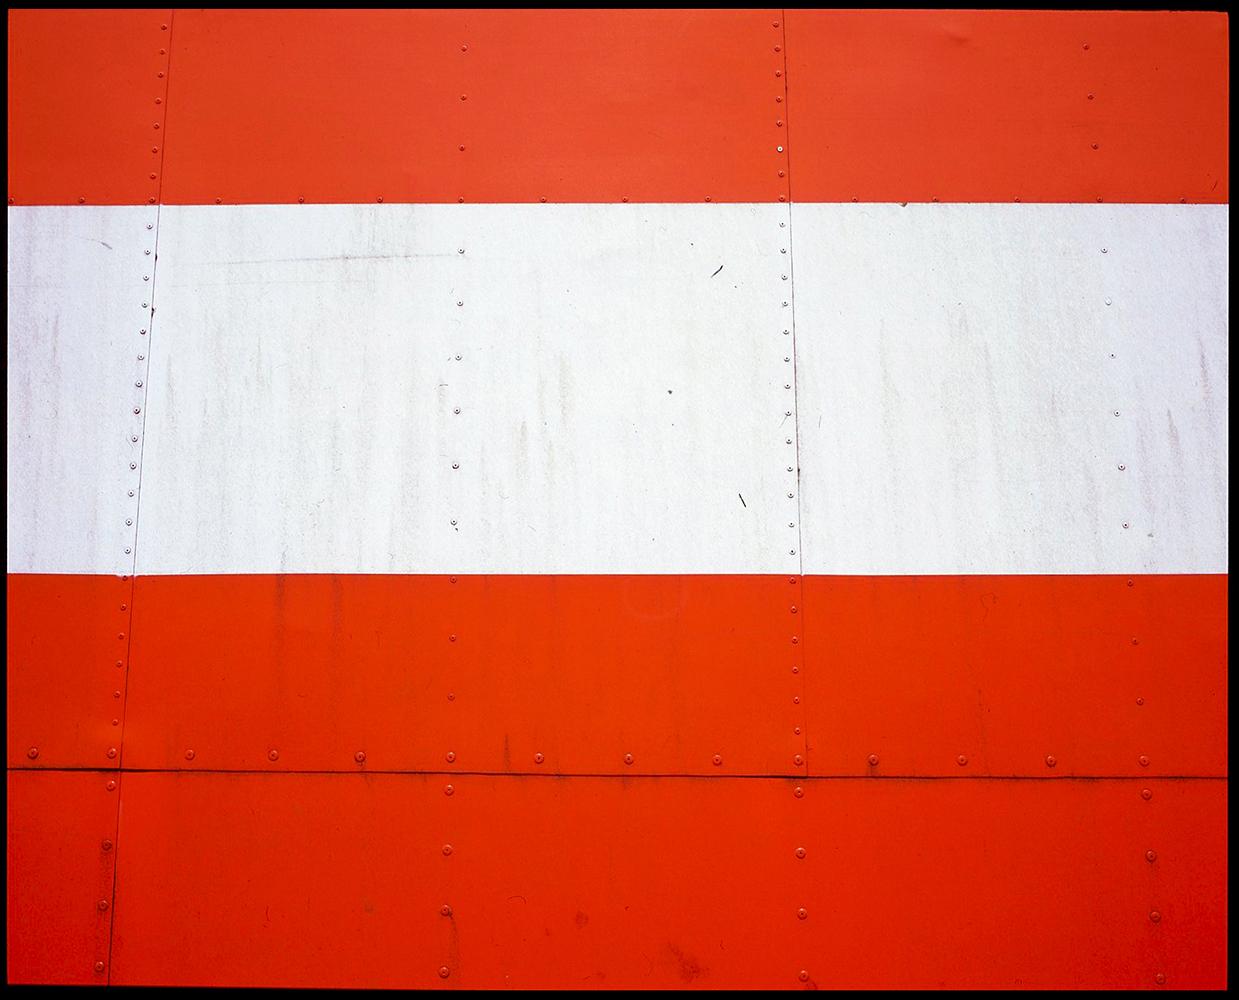 lorry_flag